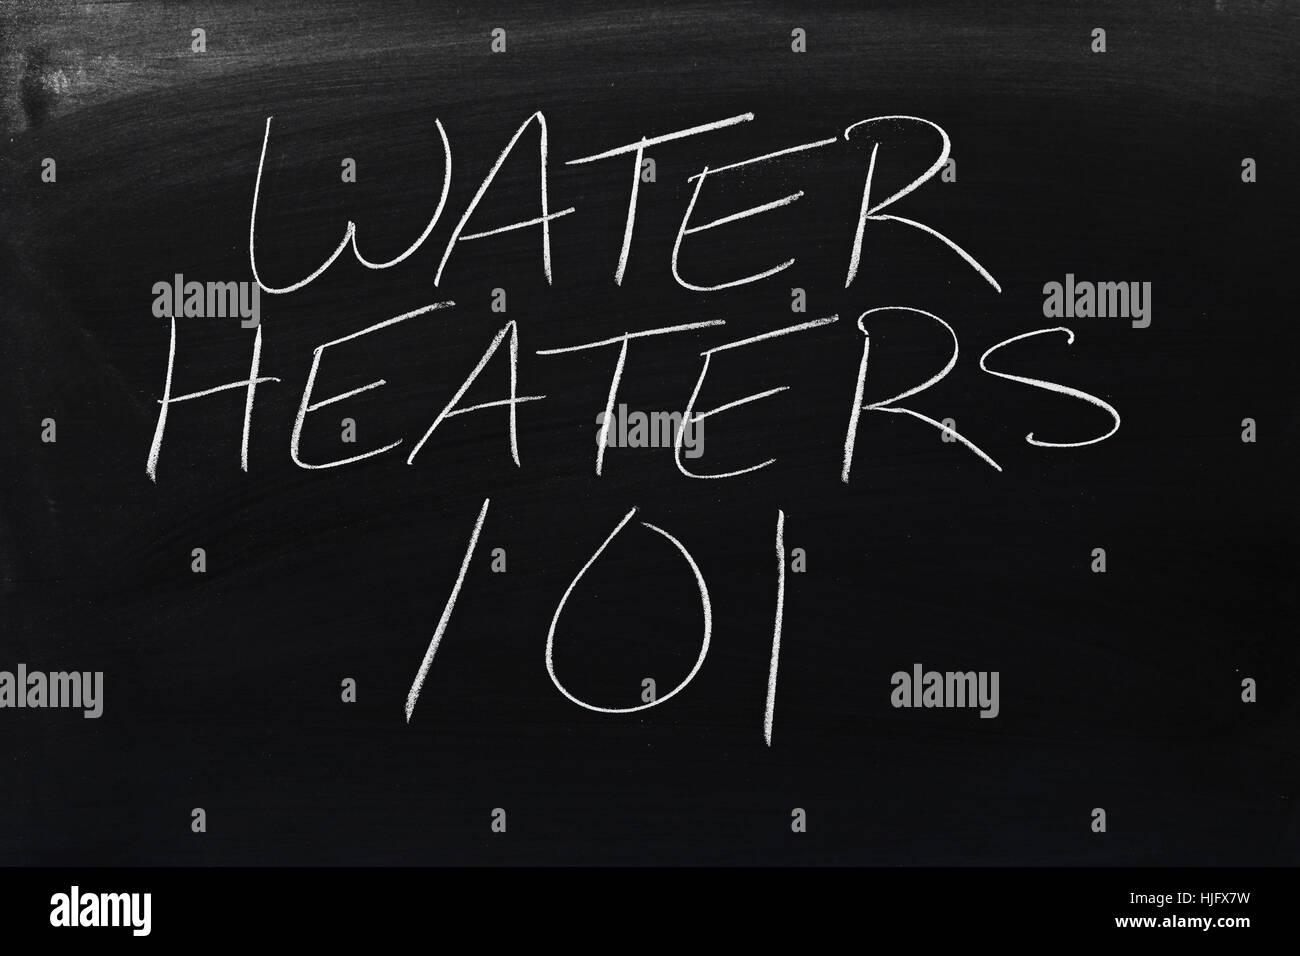 The words 'Water Heaters 101' on a blackboard in chalk - Stock Image